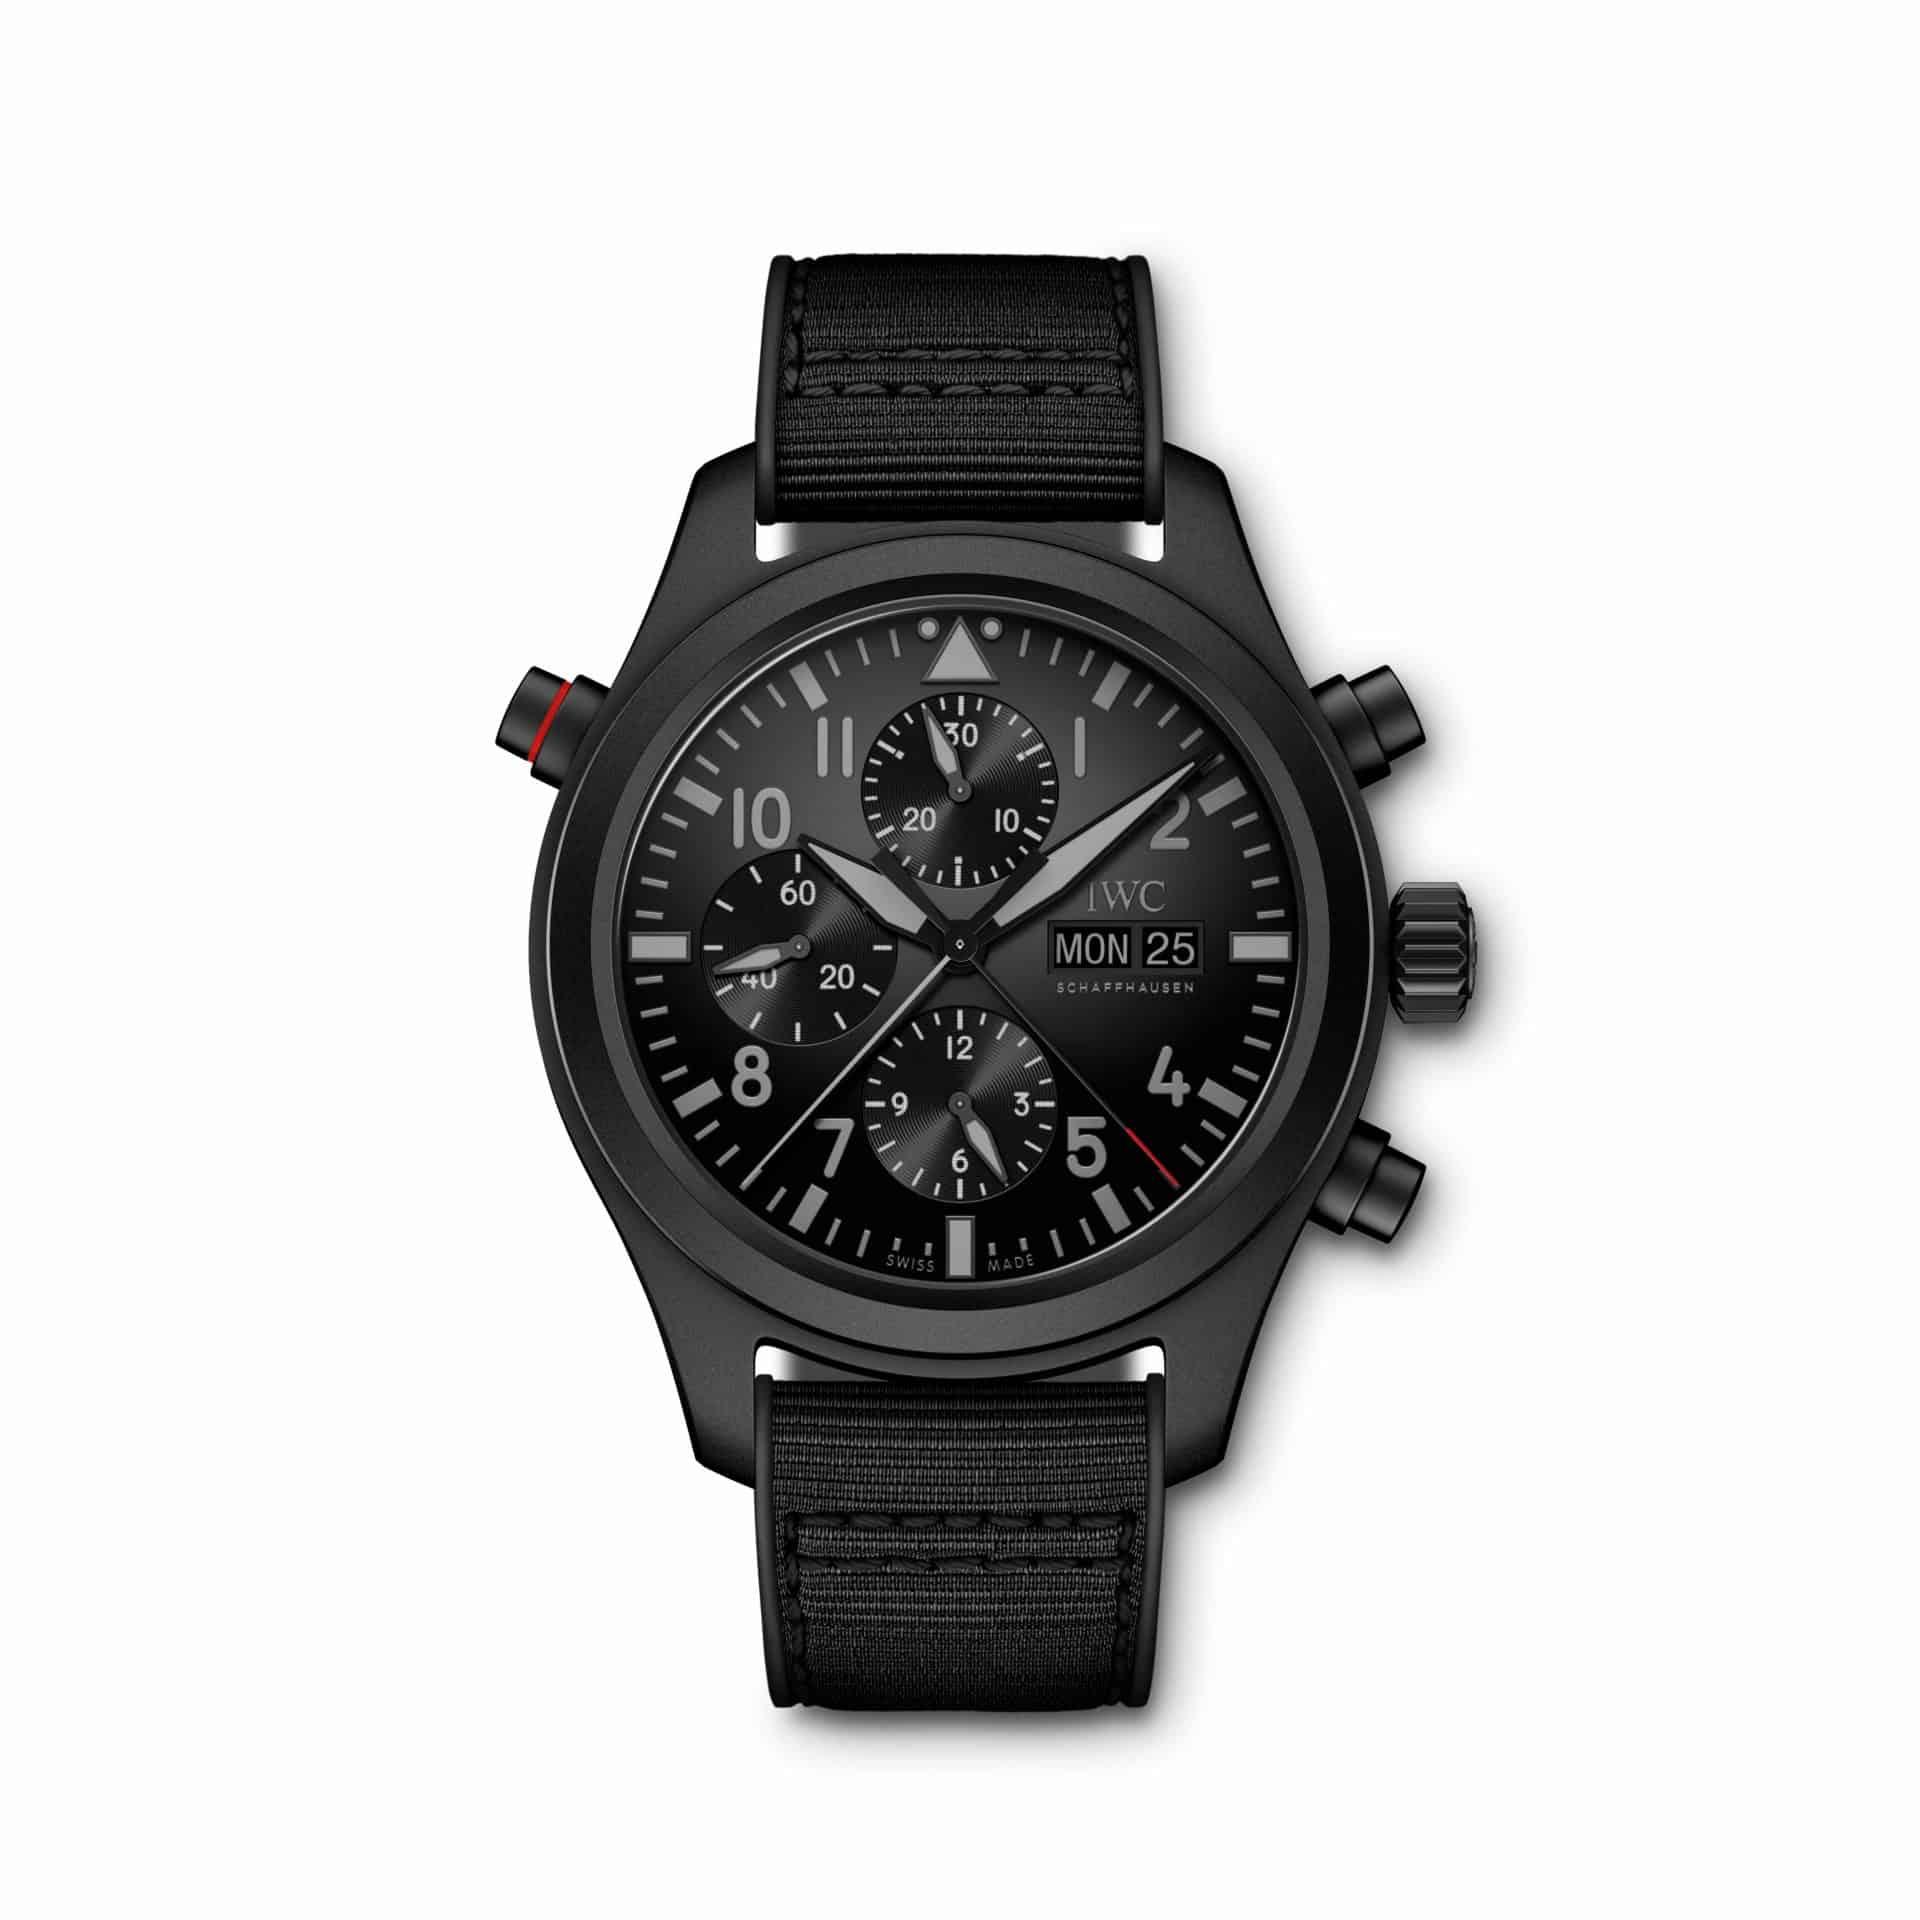 IWC_Pilot's Watch Double Chronograph TOP GUN Ceratanium